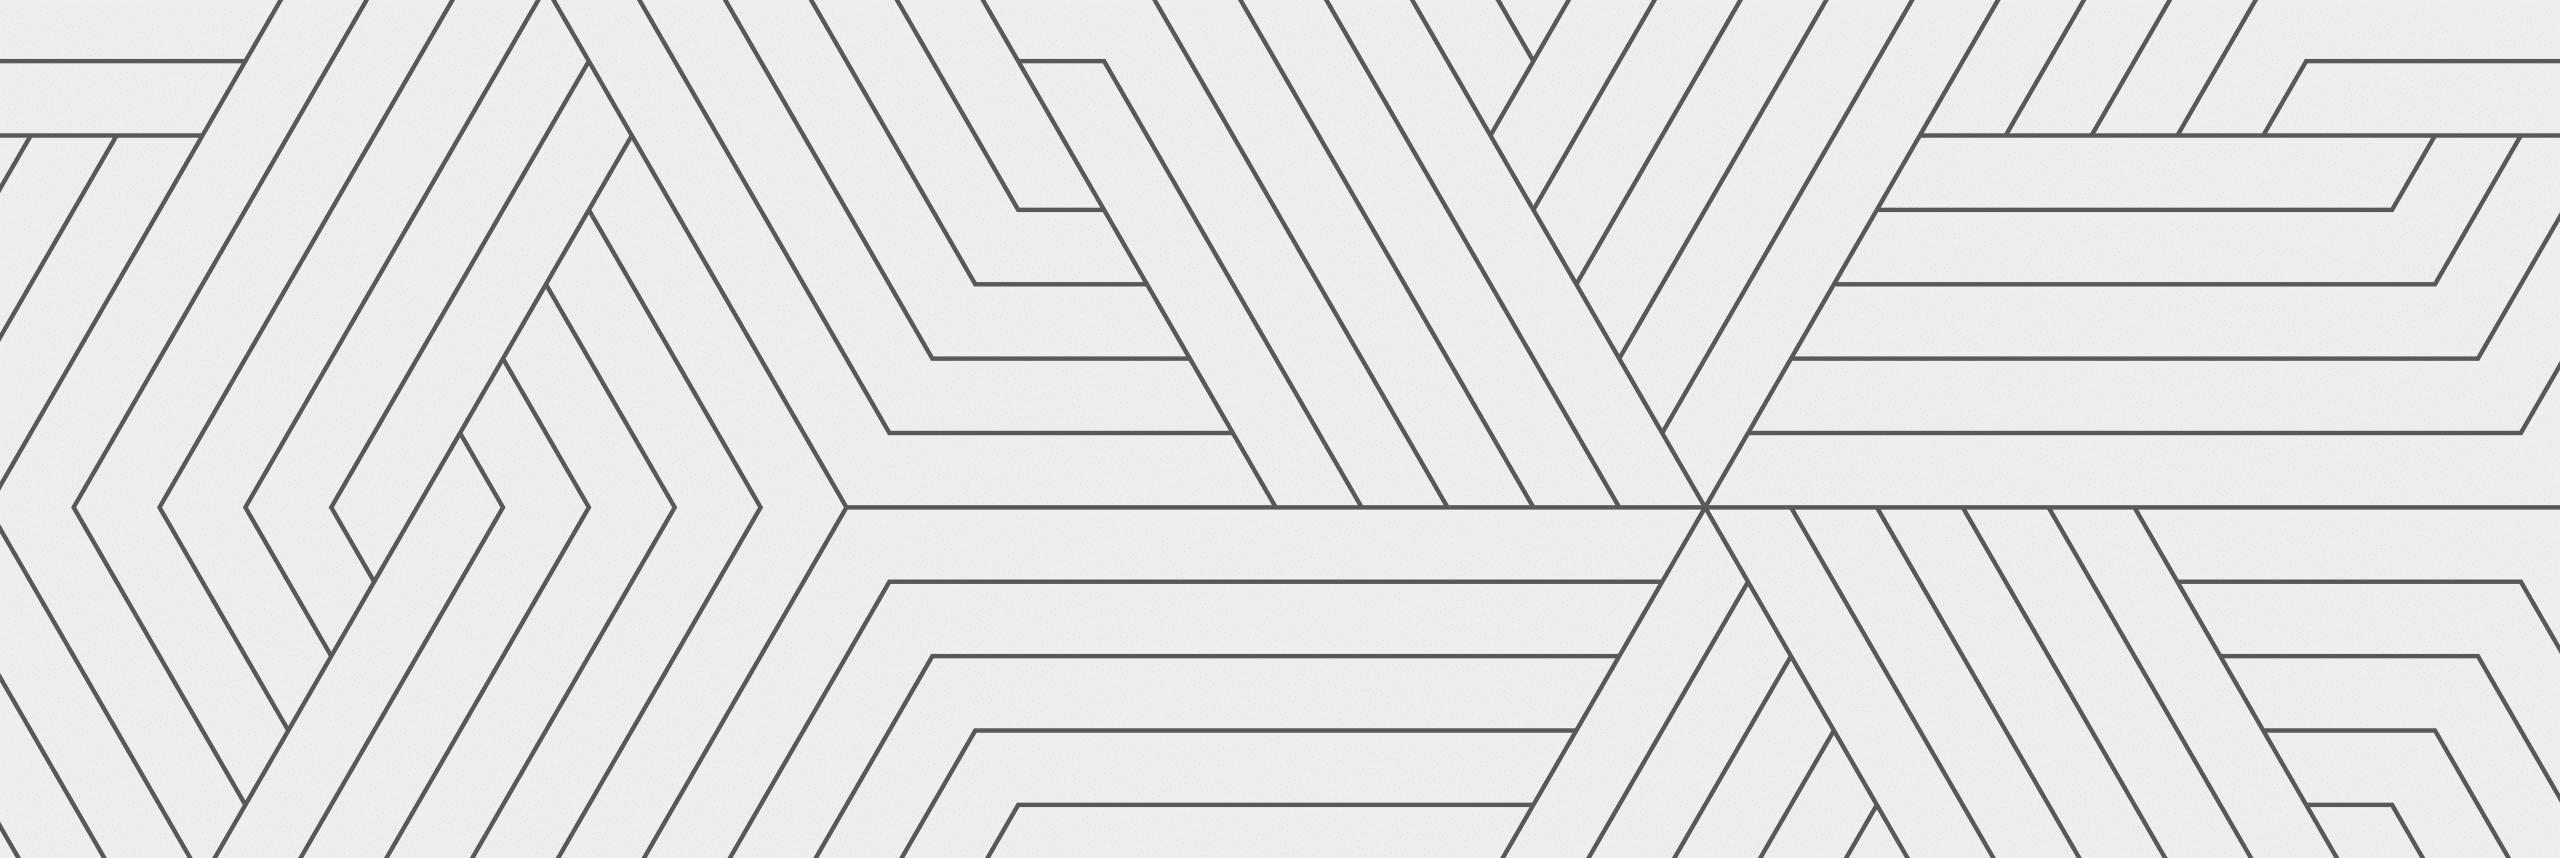 Brand marketing for interiors Decorum branded patterns